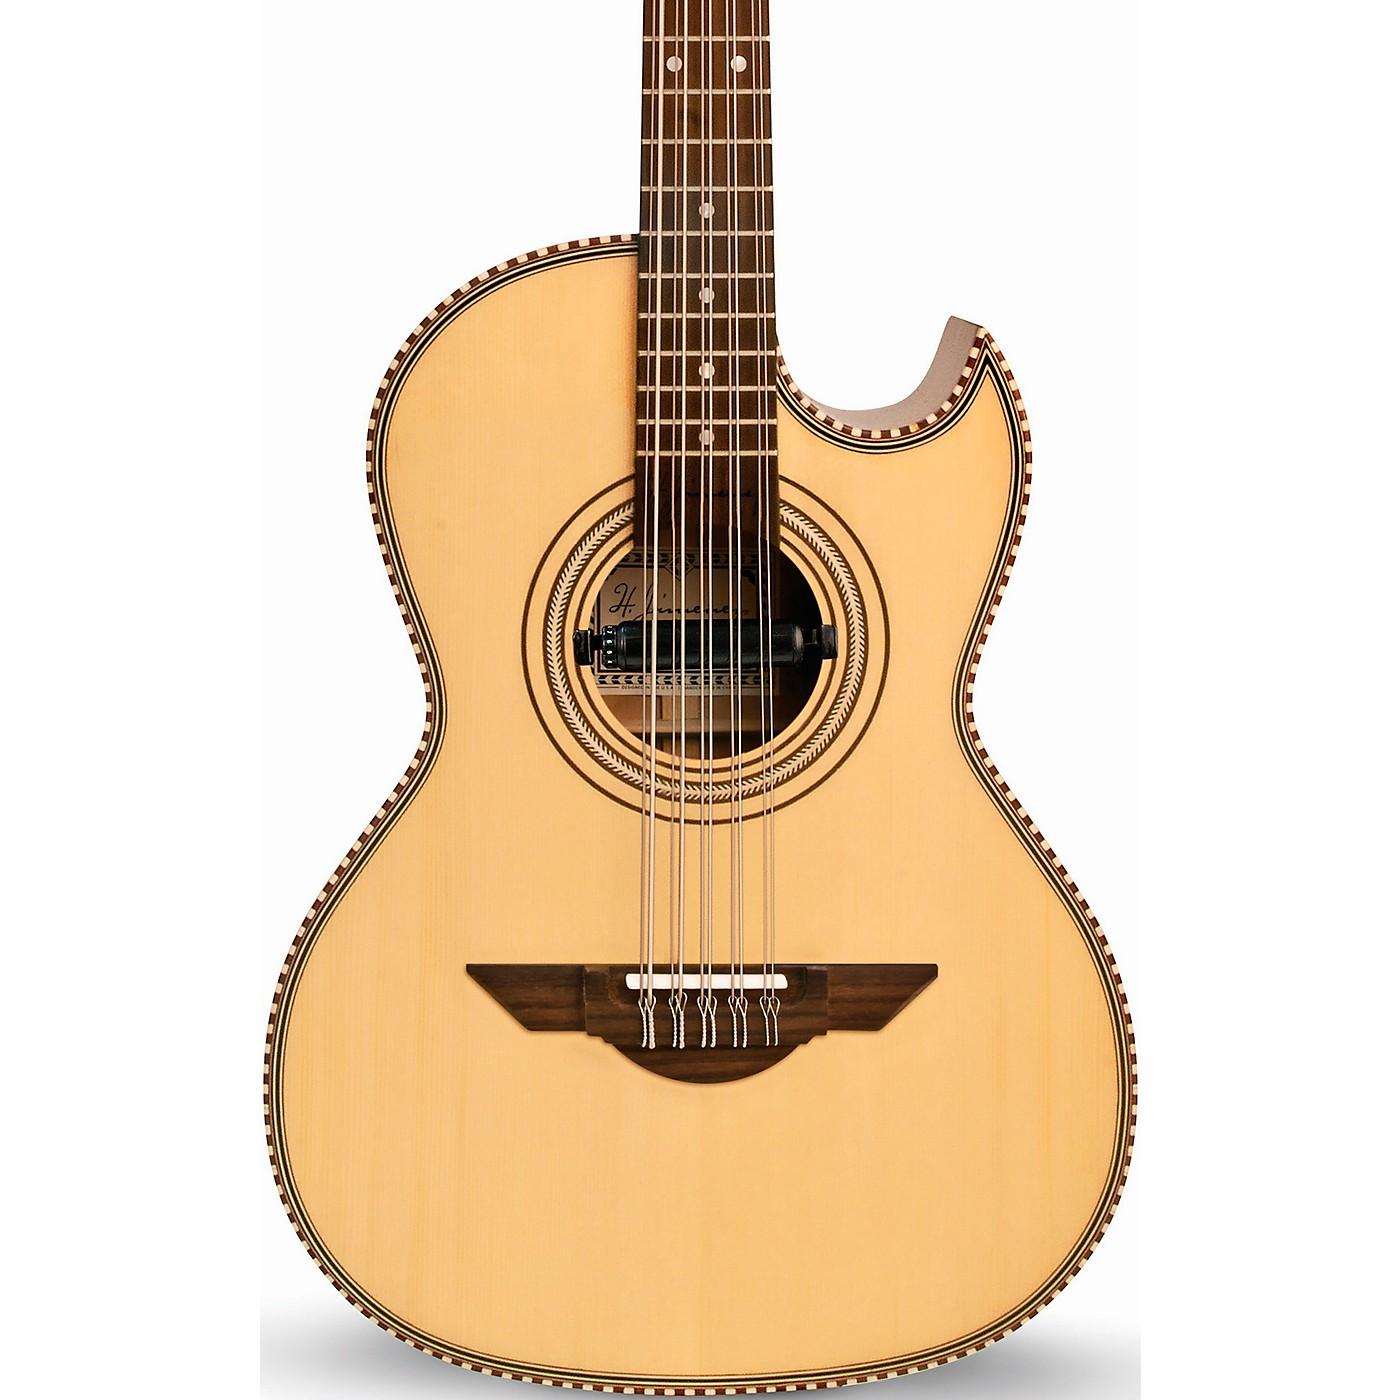 H. Jimenez LBQ1E Bajo Quinto El Estandar Series Acoustic-Electric thumbnail